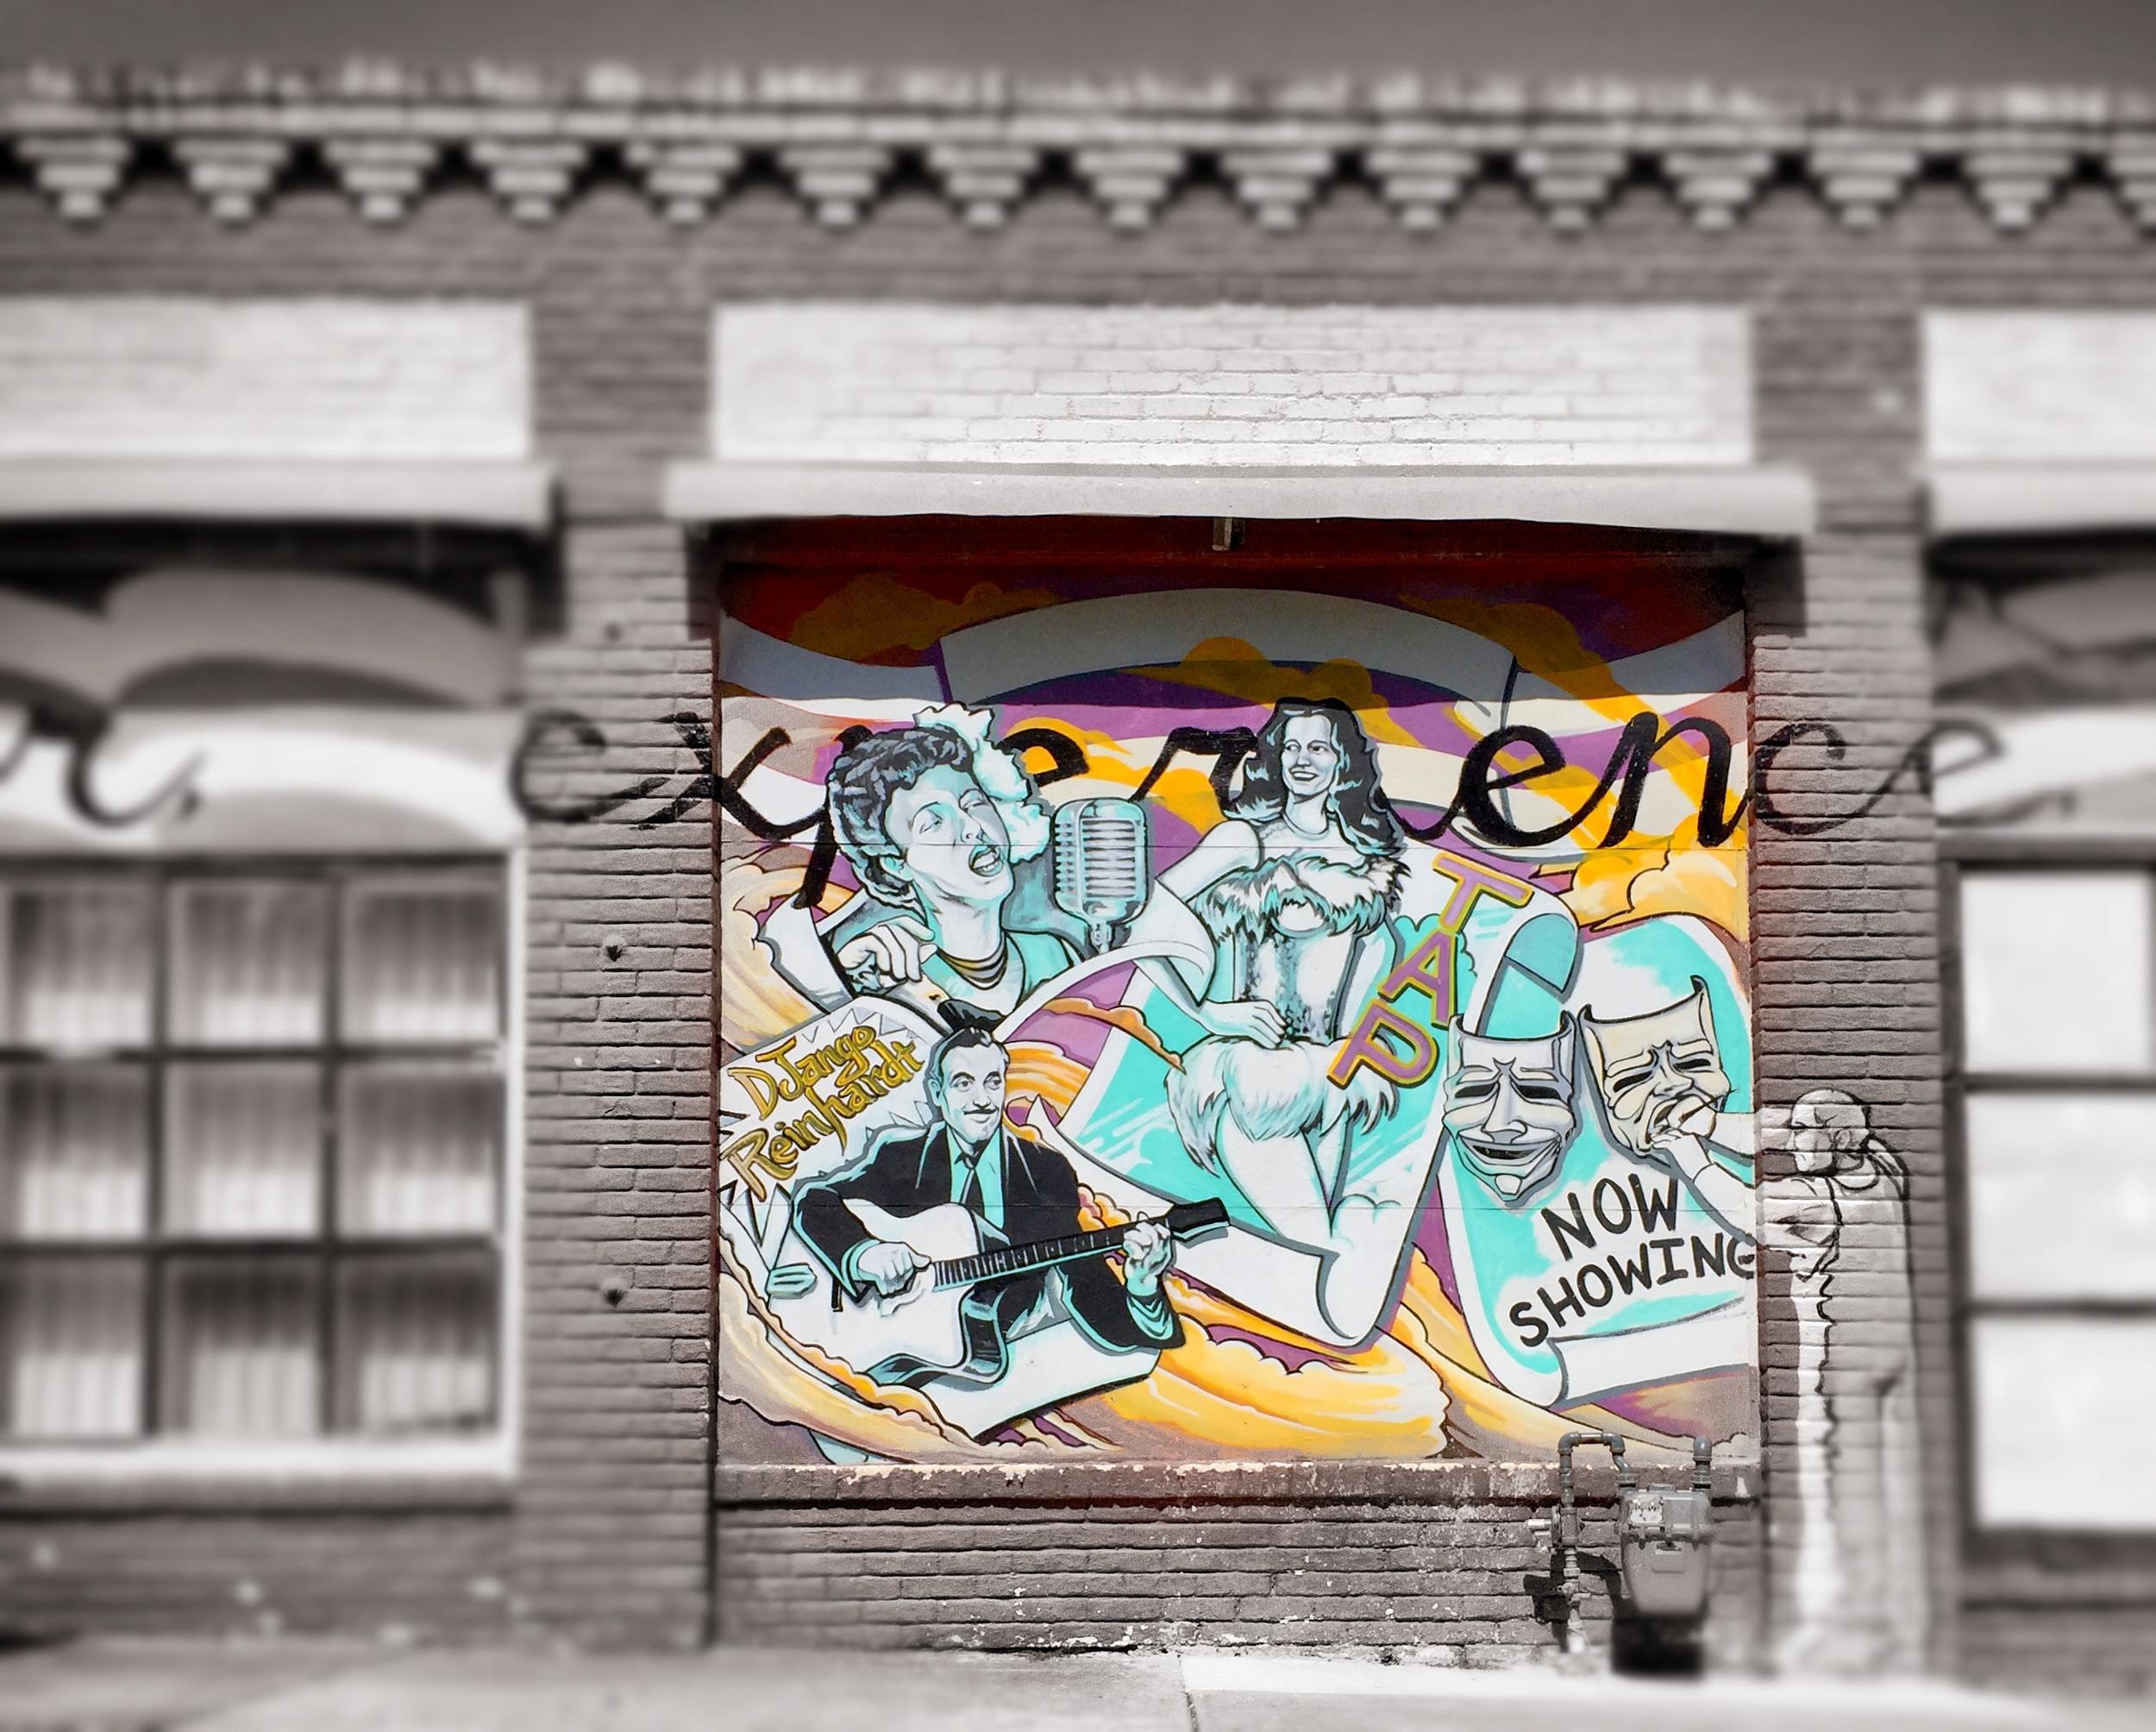 arts-fifth-avenue-mural-walls-that-talk.jpg